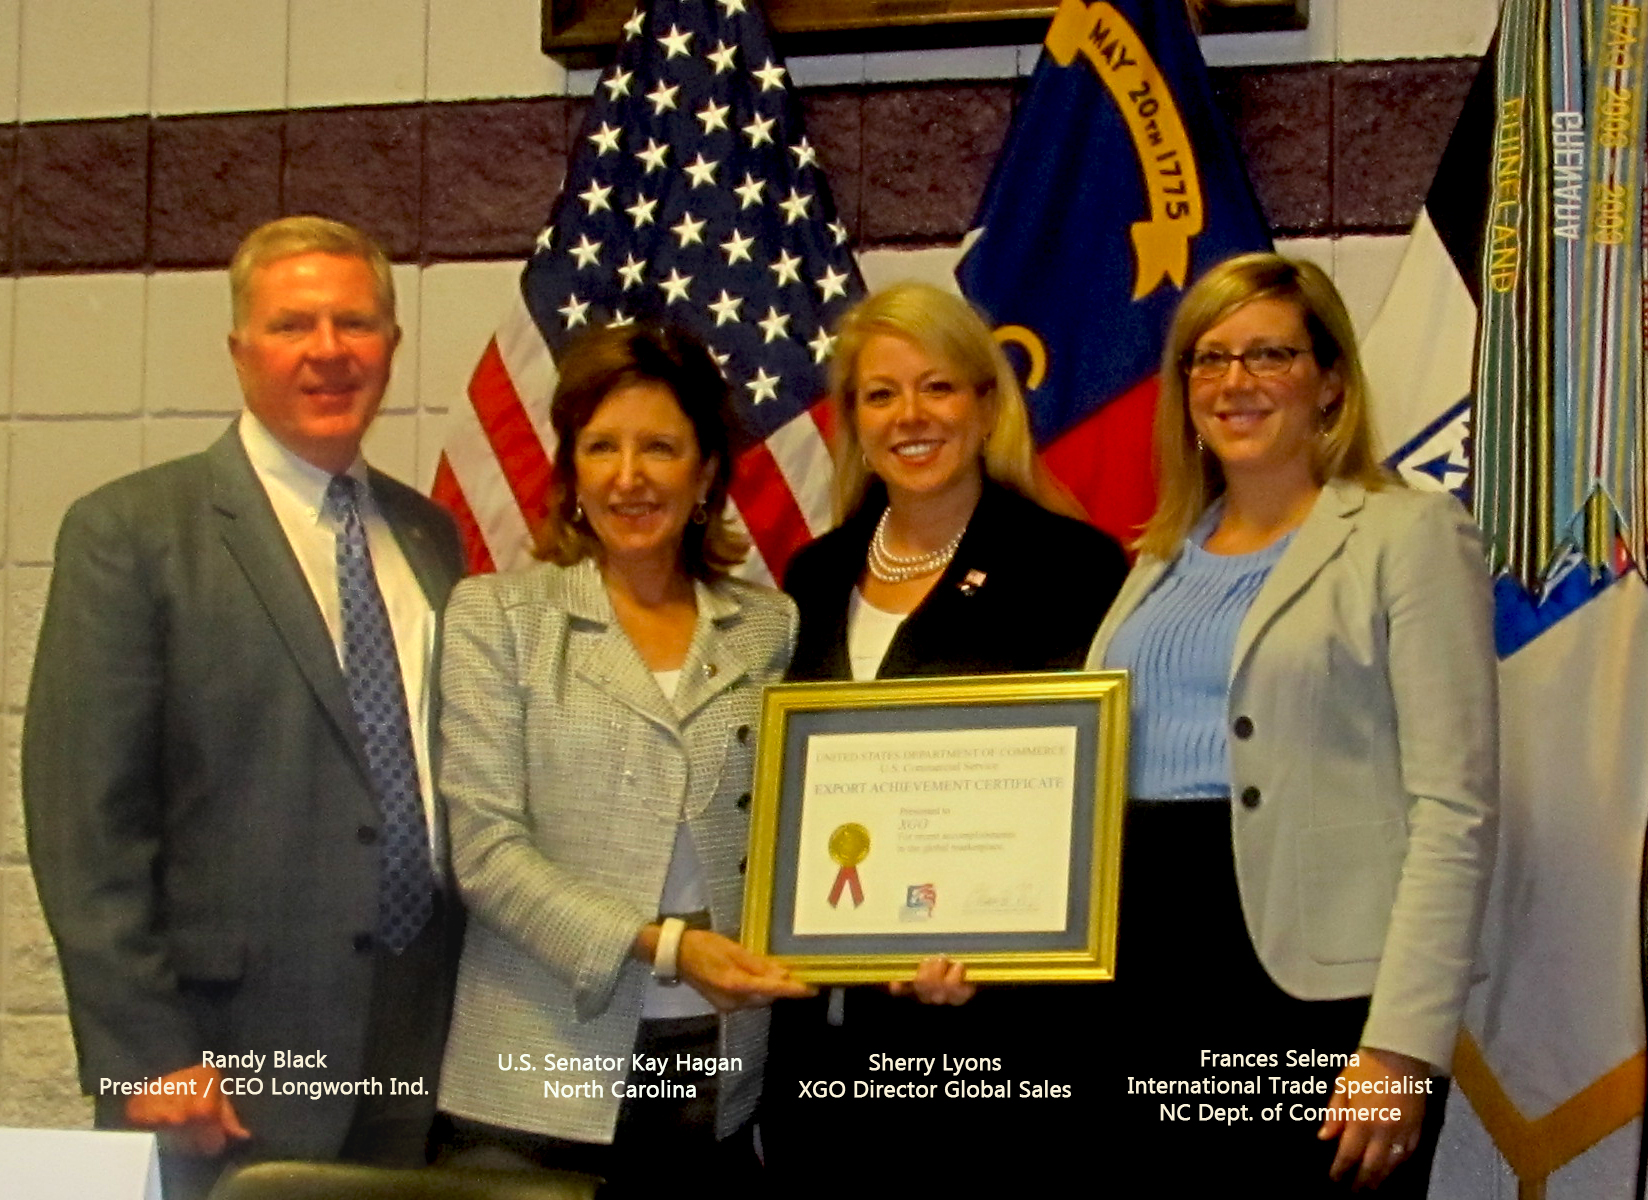 From left to right: Randy Black, U.S. Senator Kay Hagan, Sherry Lyons, Frances Selema